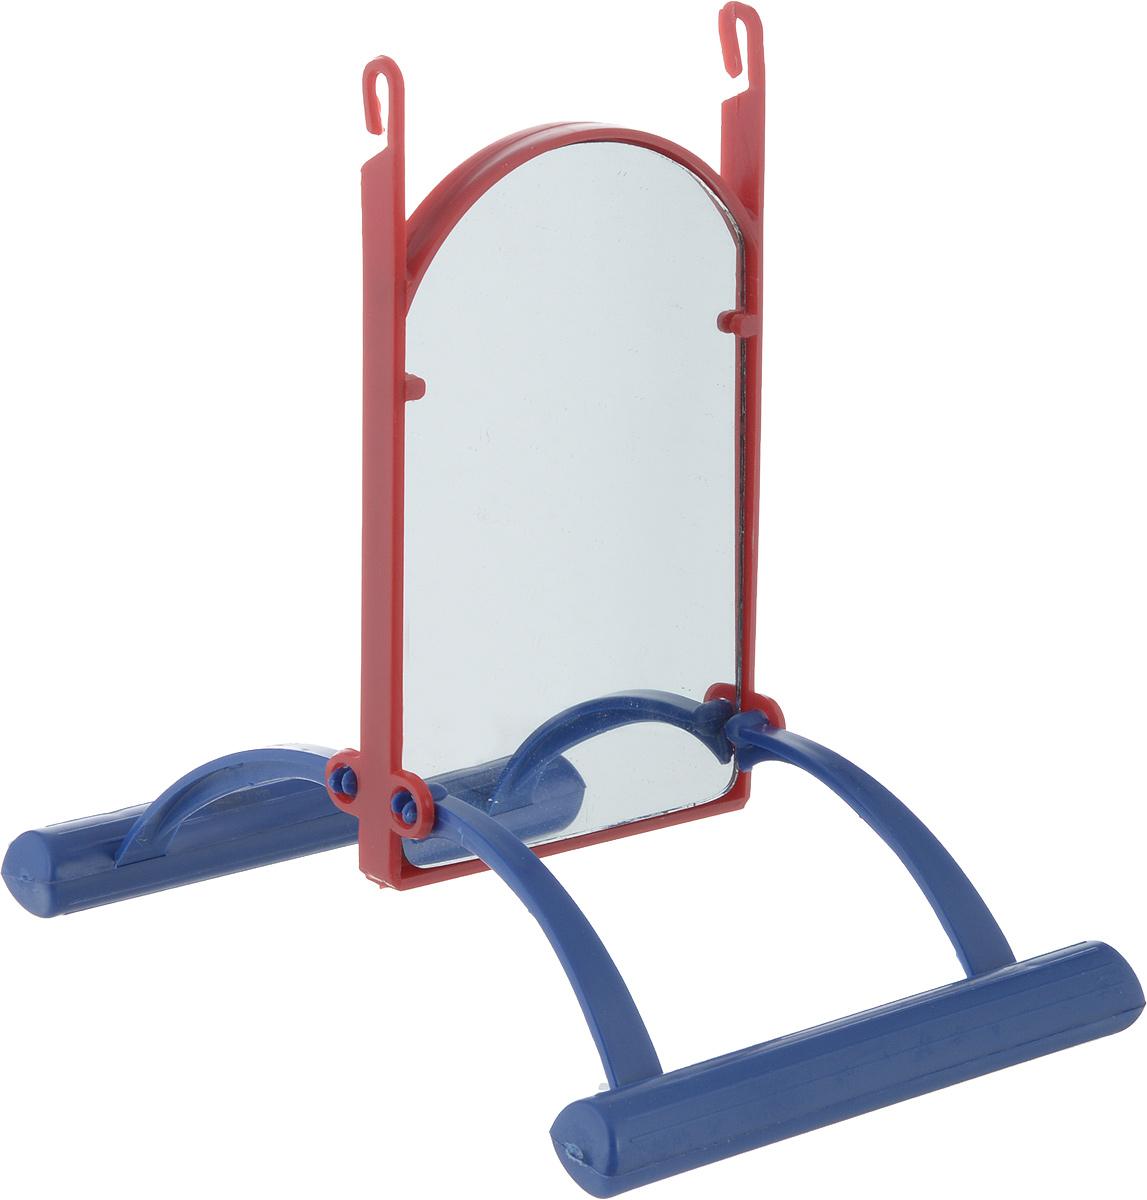 Зеркало для попугая Trixie, цвет: синий, красный, вид 2, 13 см trixie шлейка trixie для собак размер s m 35 60 см 15 мм синяя